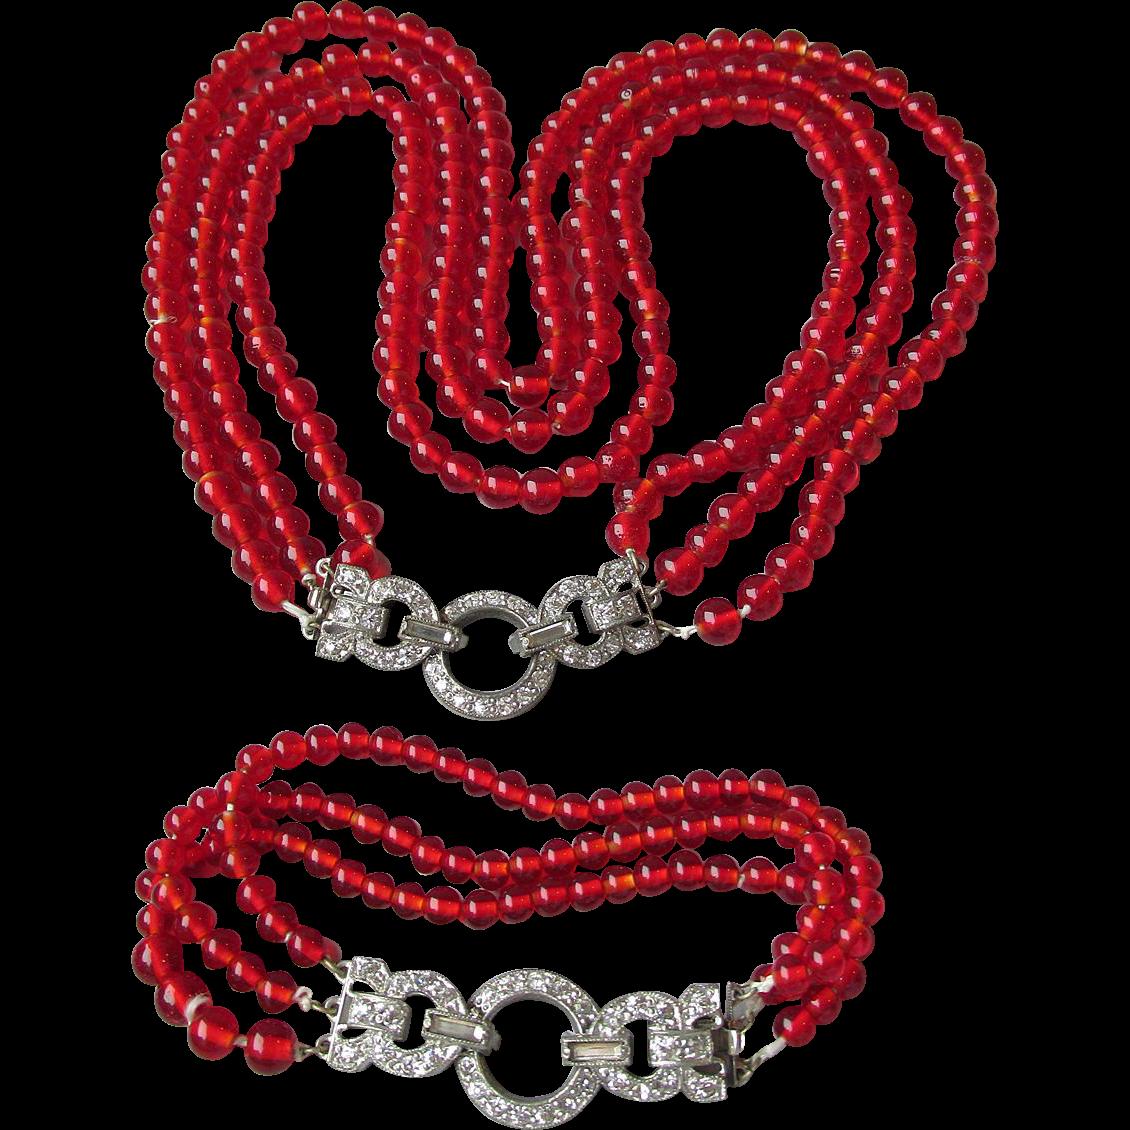 1920's Vintage Triple Strand Red Glass Bead Art Deco Rhinestone Clasp Bracelet & Flapper Necklace Set